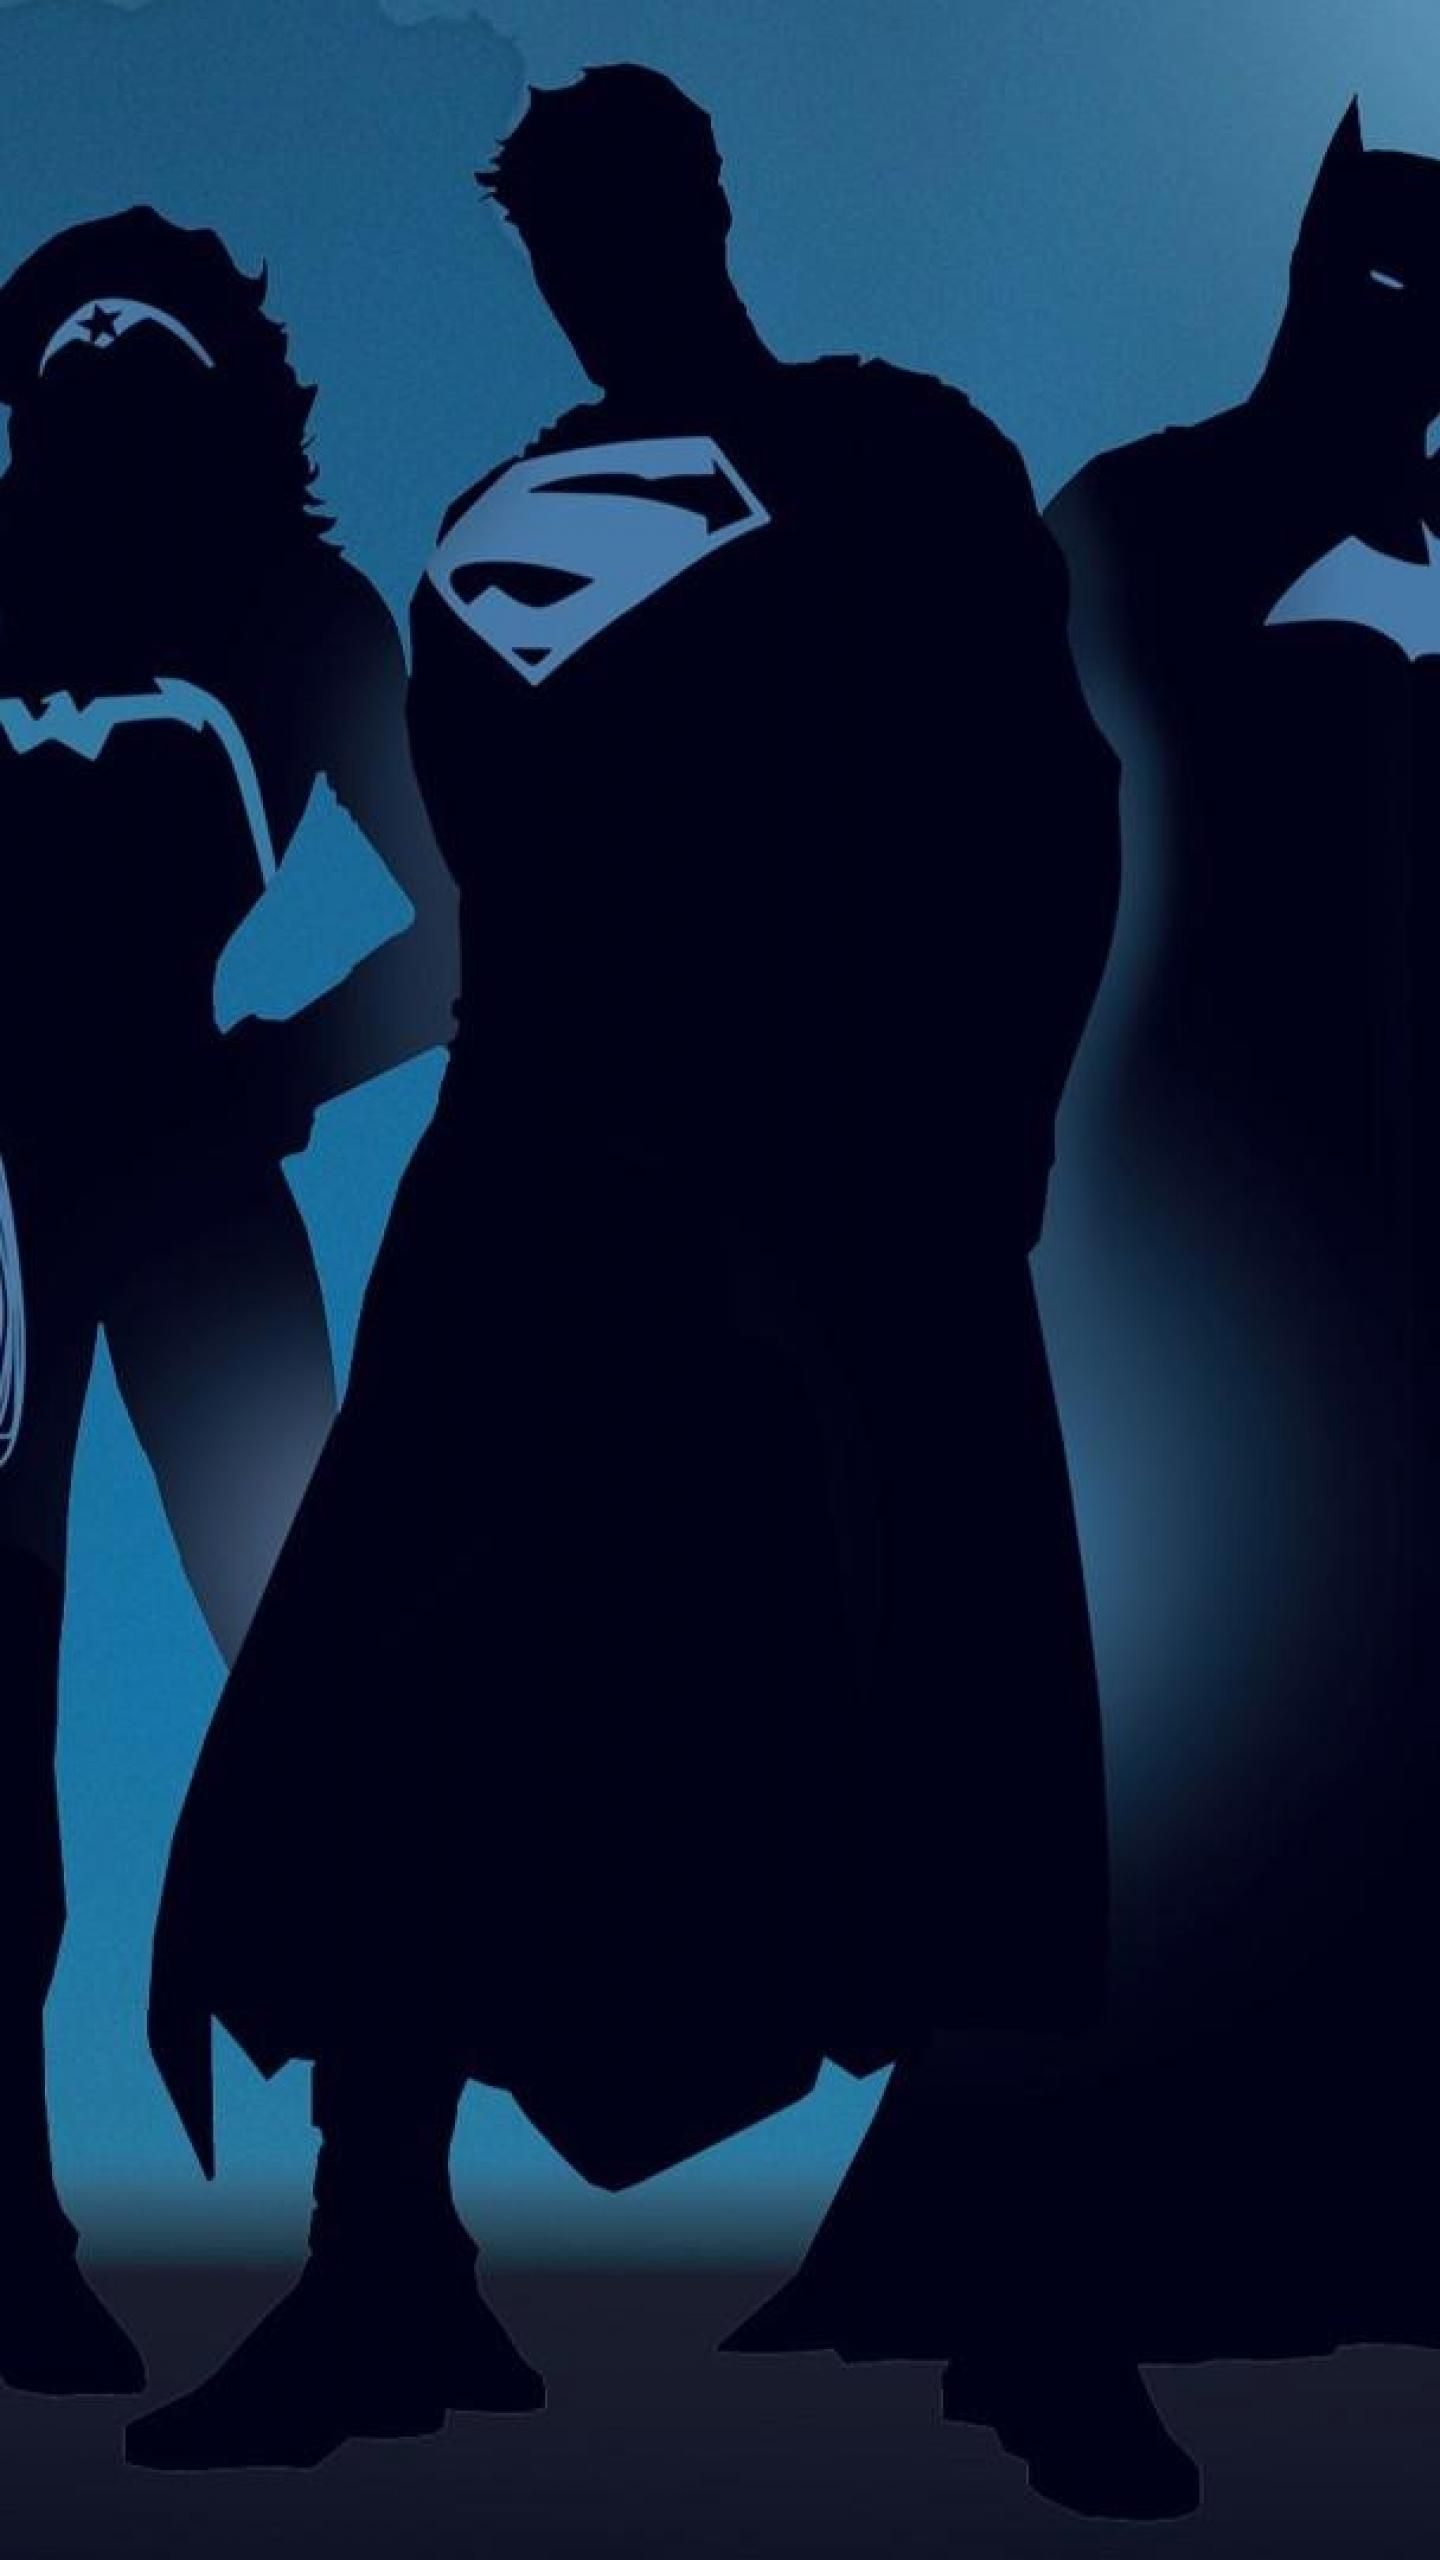 Superhero Mobile Wallpapers Top Free Superhero Mobile